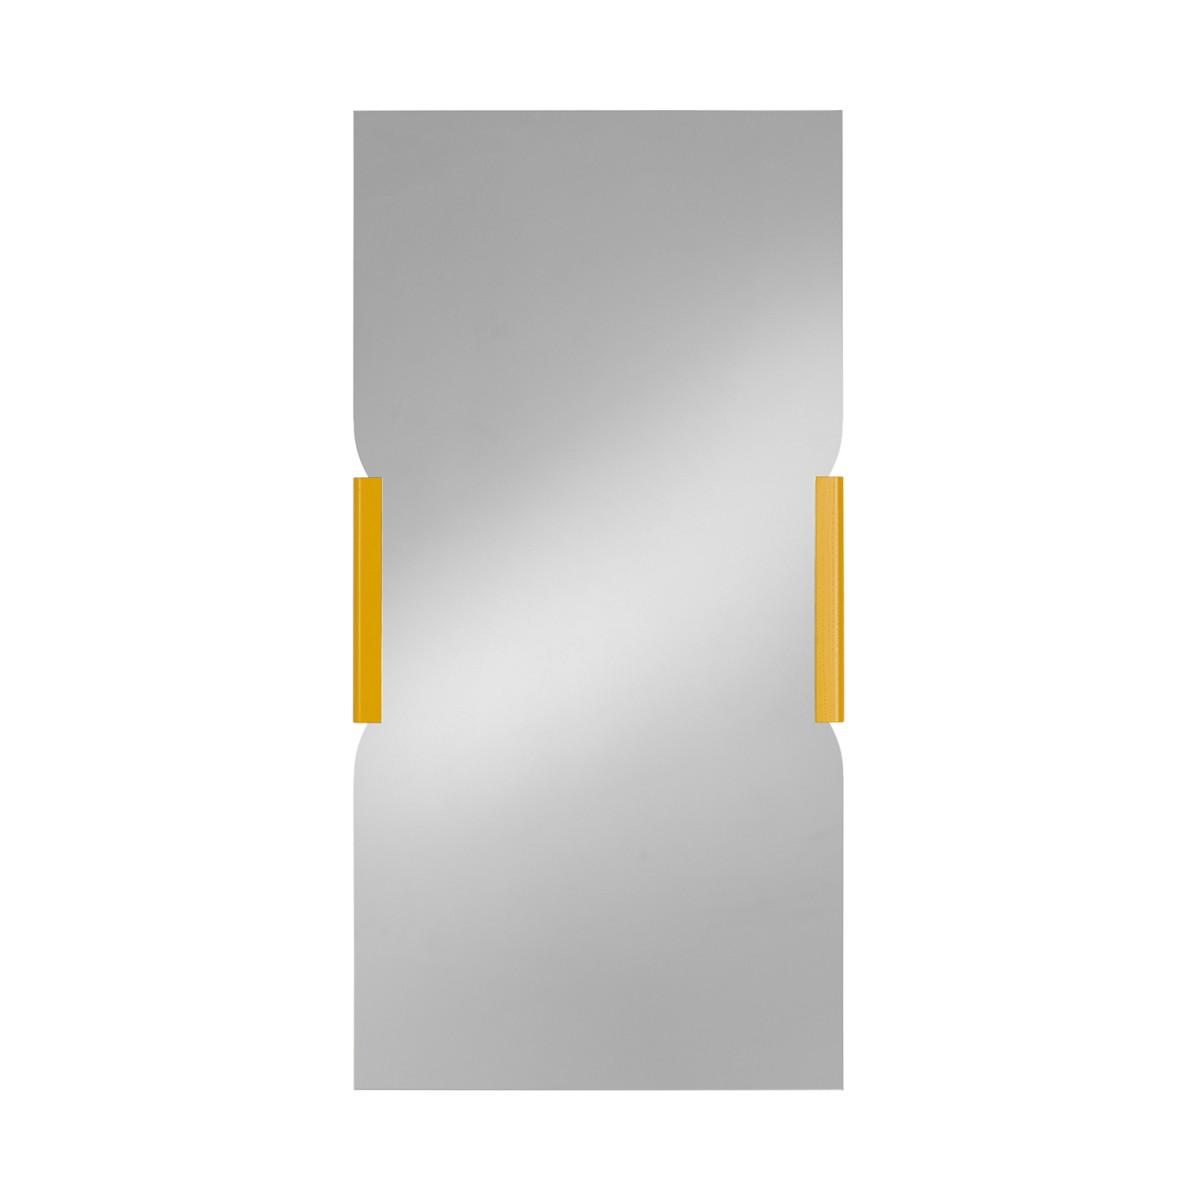 BRACE Wandspiegel Höhe 100 cm Eiche natur